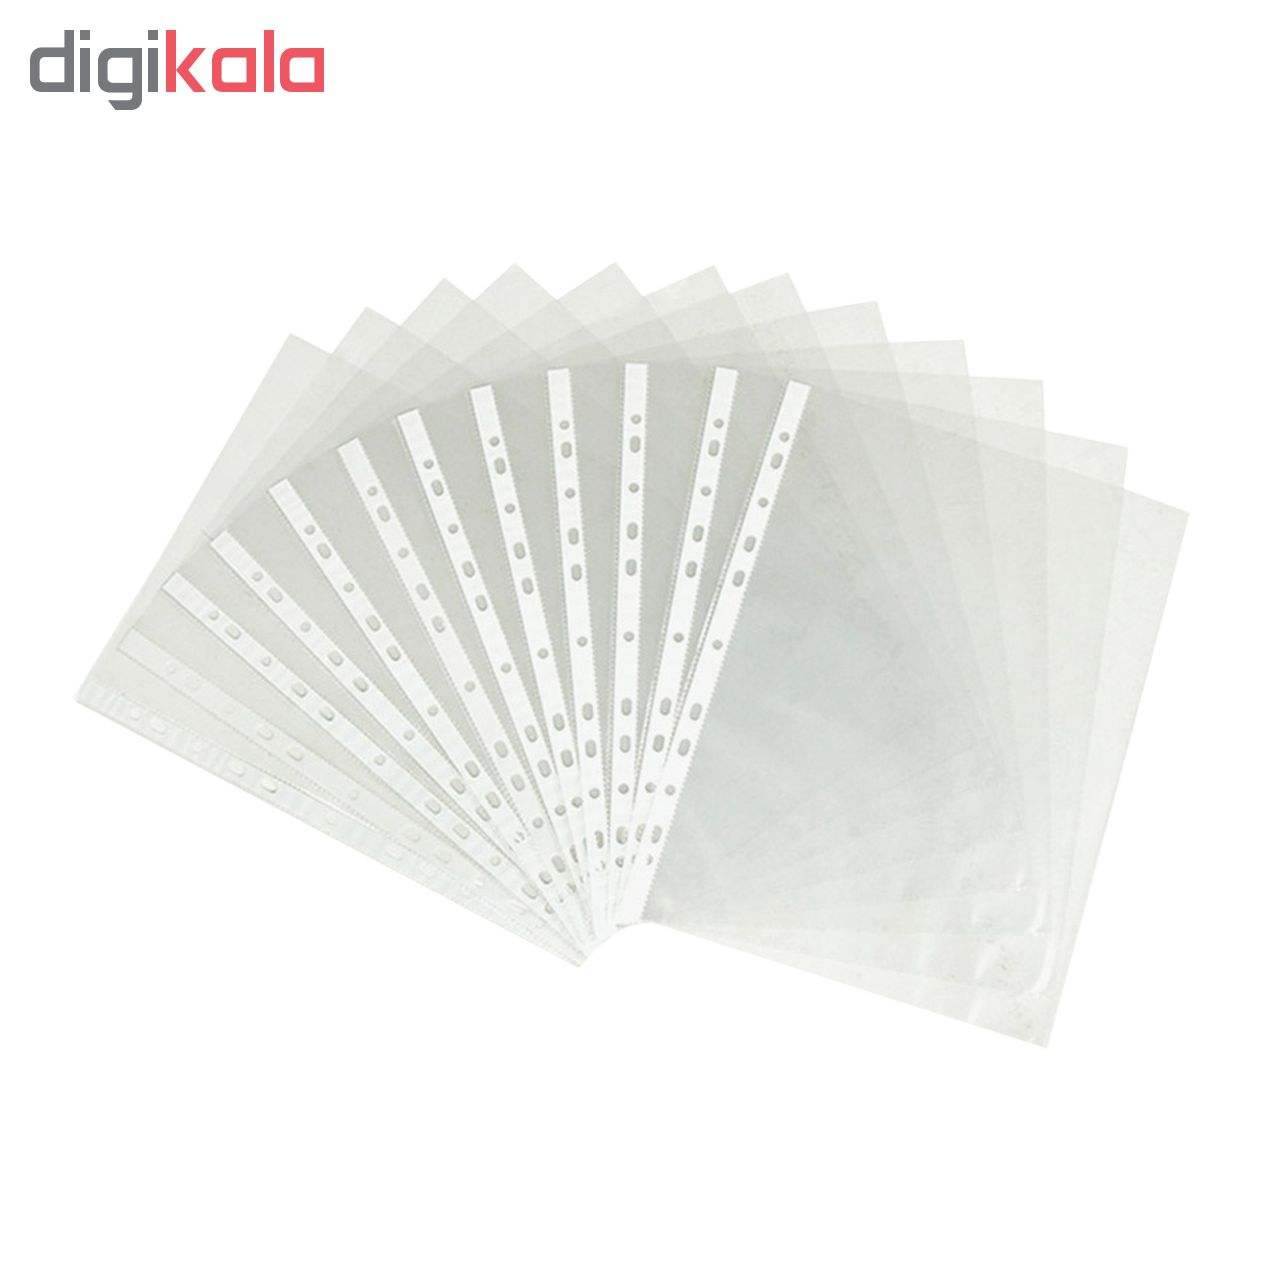 کاور کاغذ کد 6 بسته 100 عددی به همراه گیره پوشه واشین کد 4 بسته 50 عددی